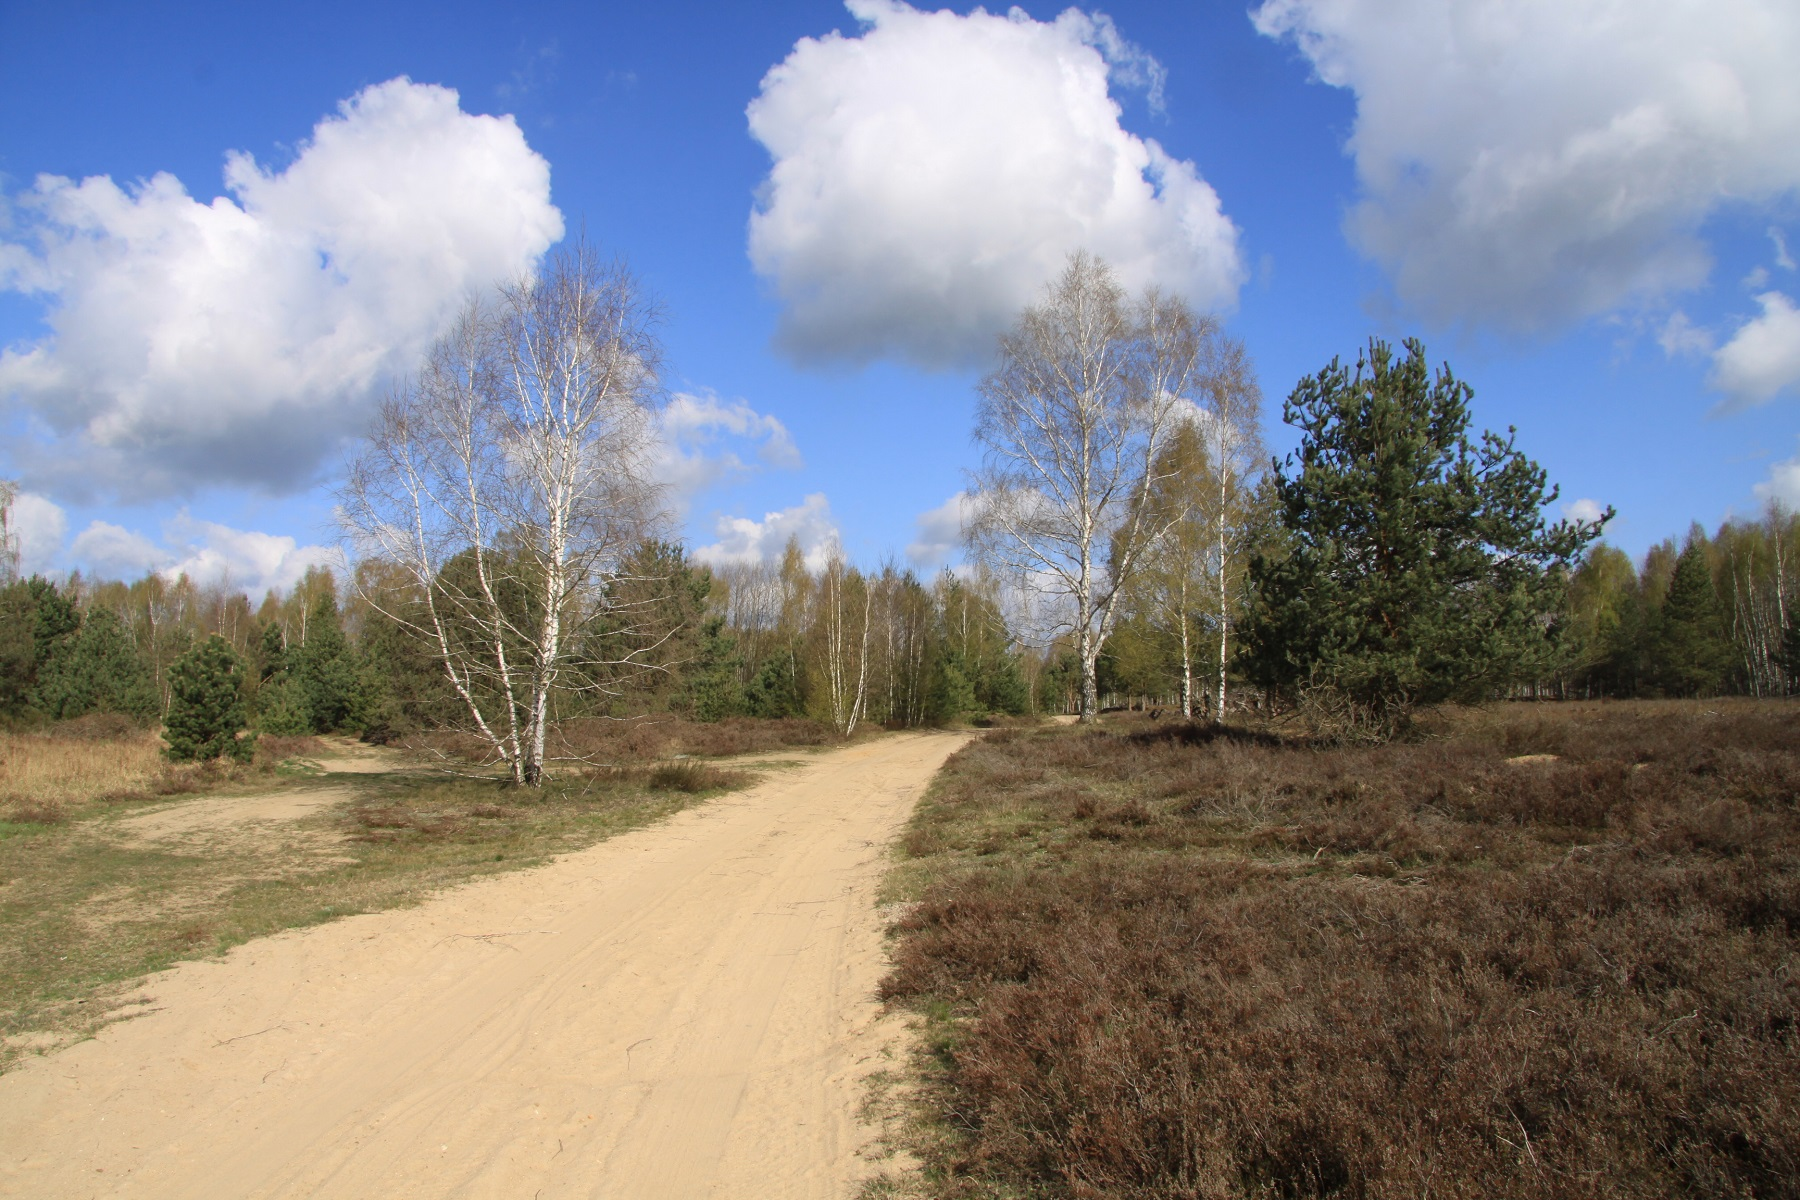 Woltersdorfer Heide Foto Martin Schulze RANA 1800 x1200 Pixel